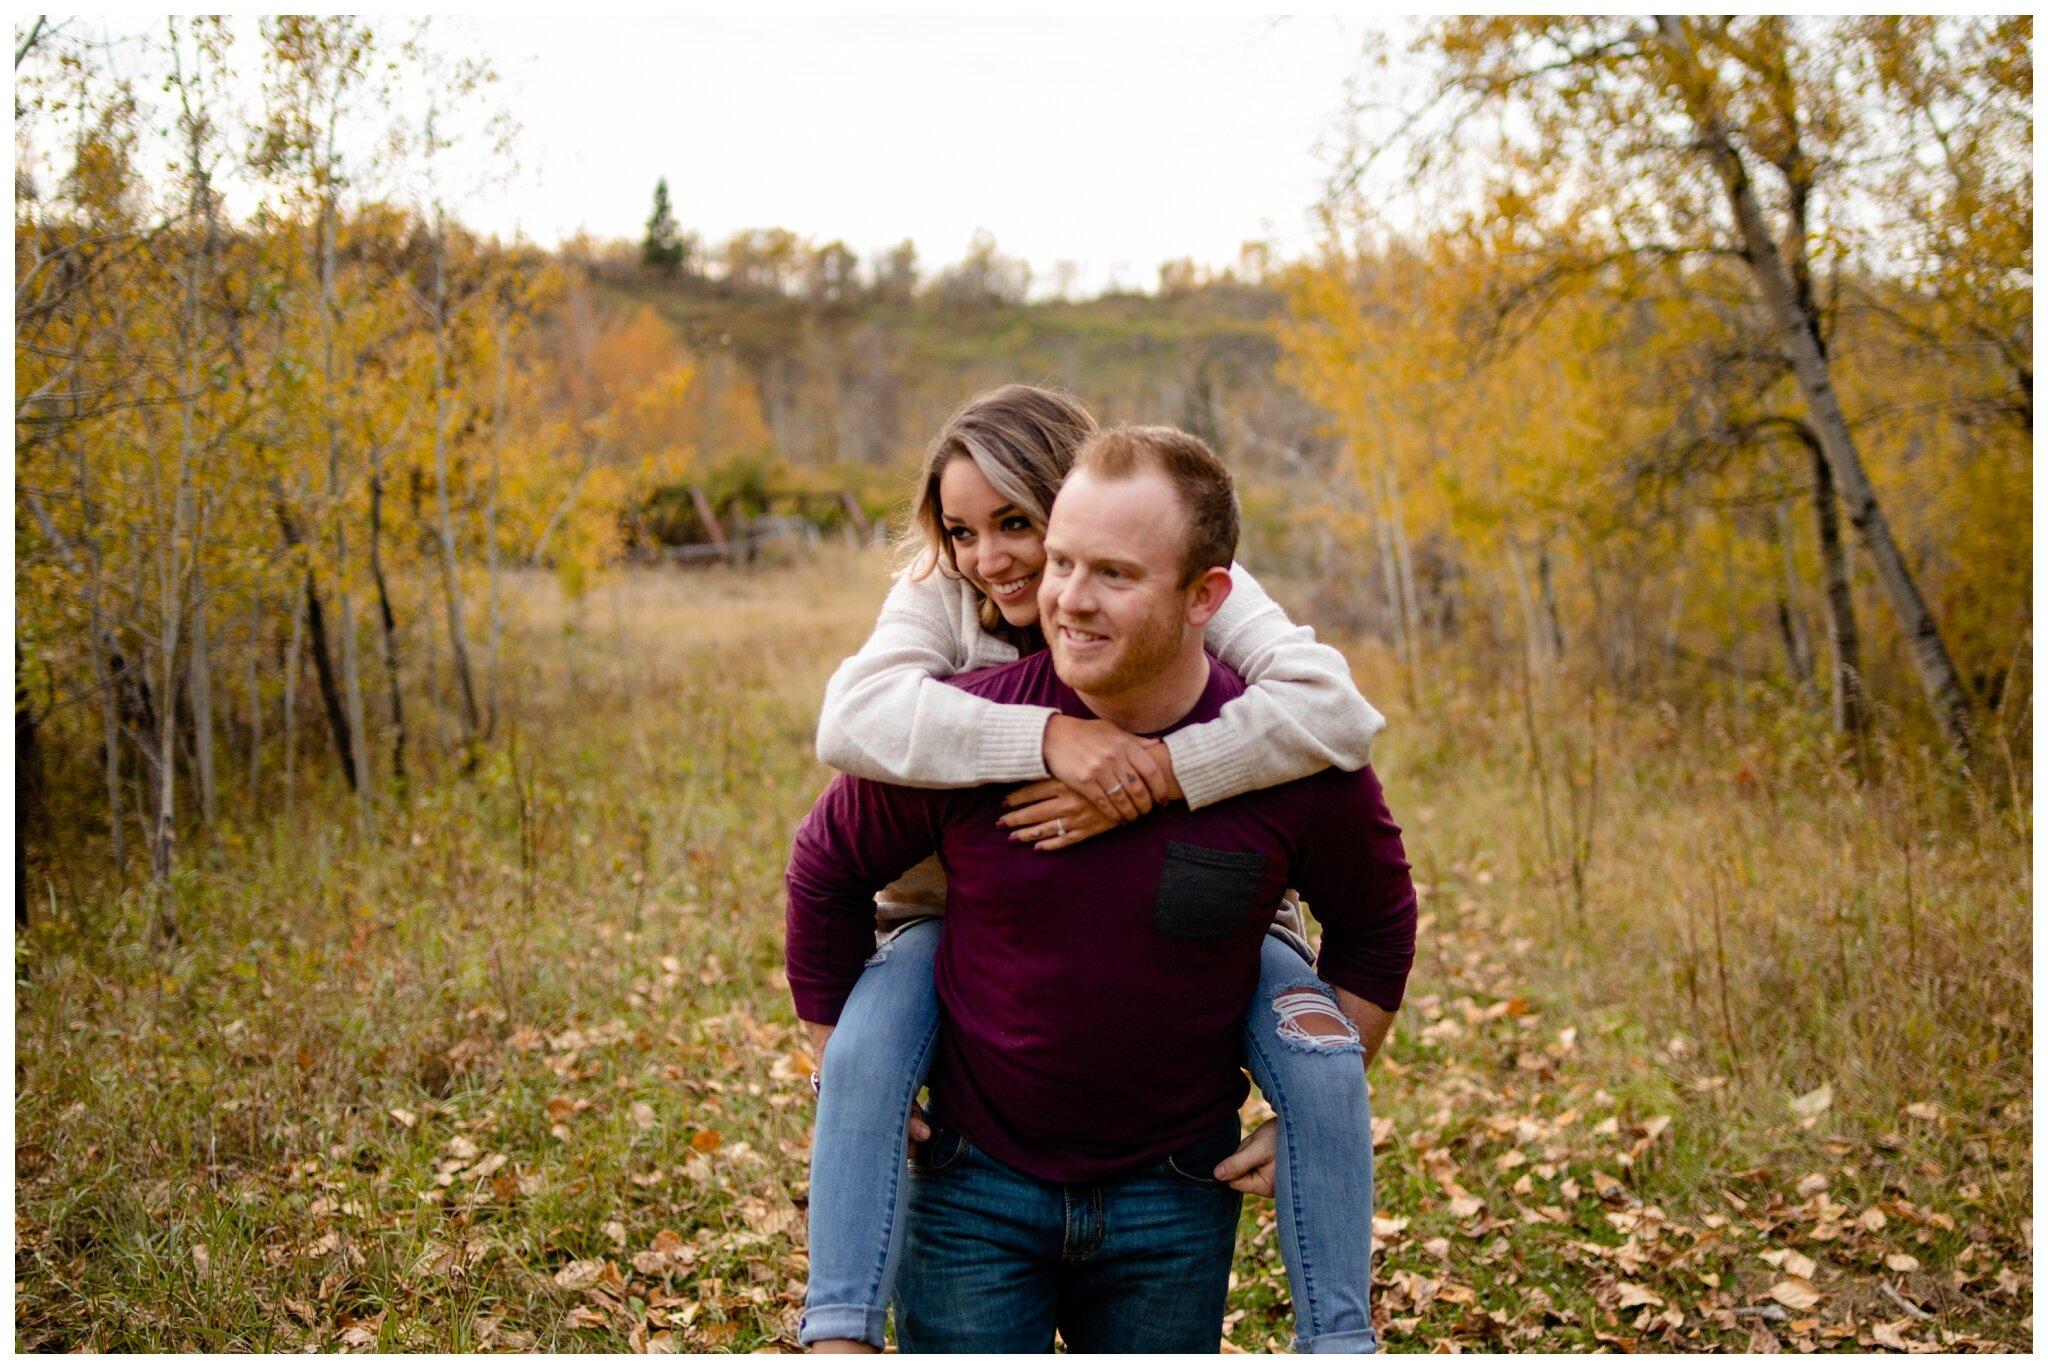 Edmonton Engagement Photographer Romantic Couples Photos Local YEG Strathcona County_0011.jpg